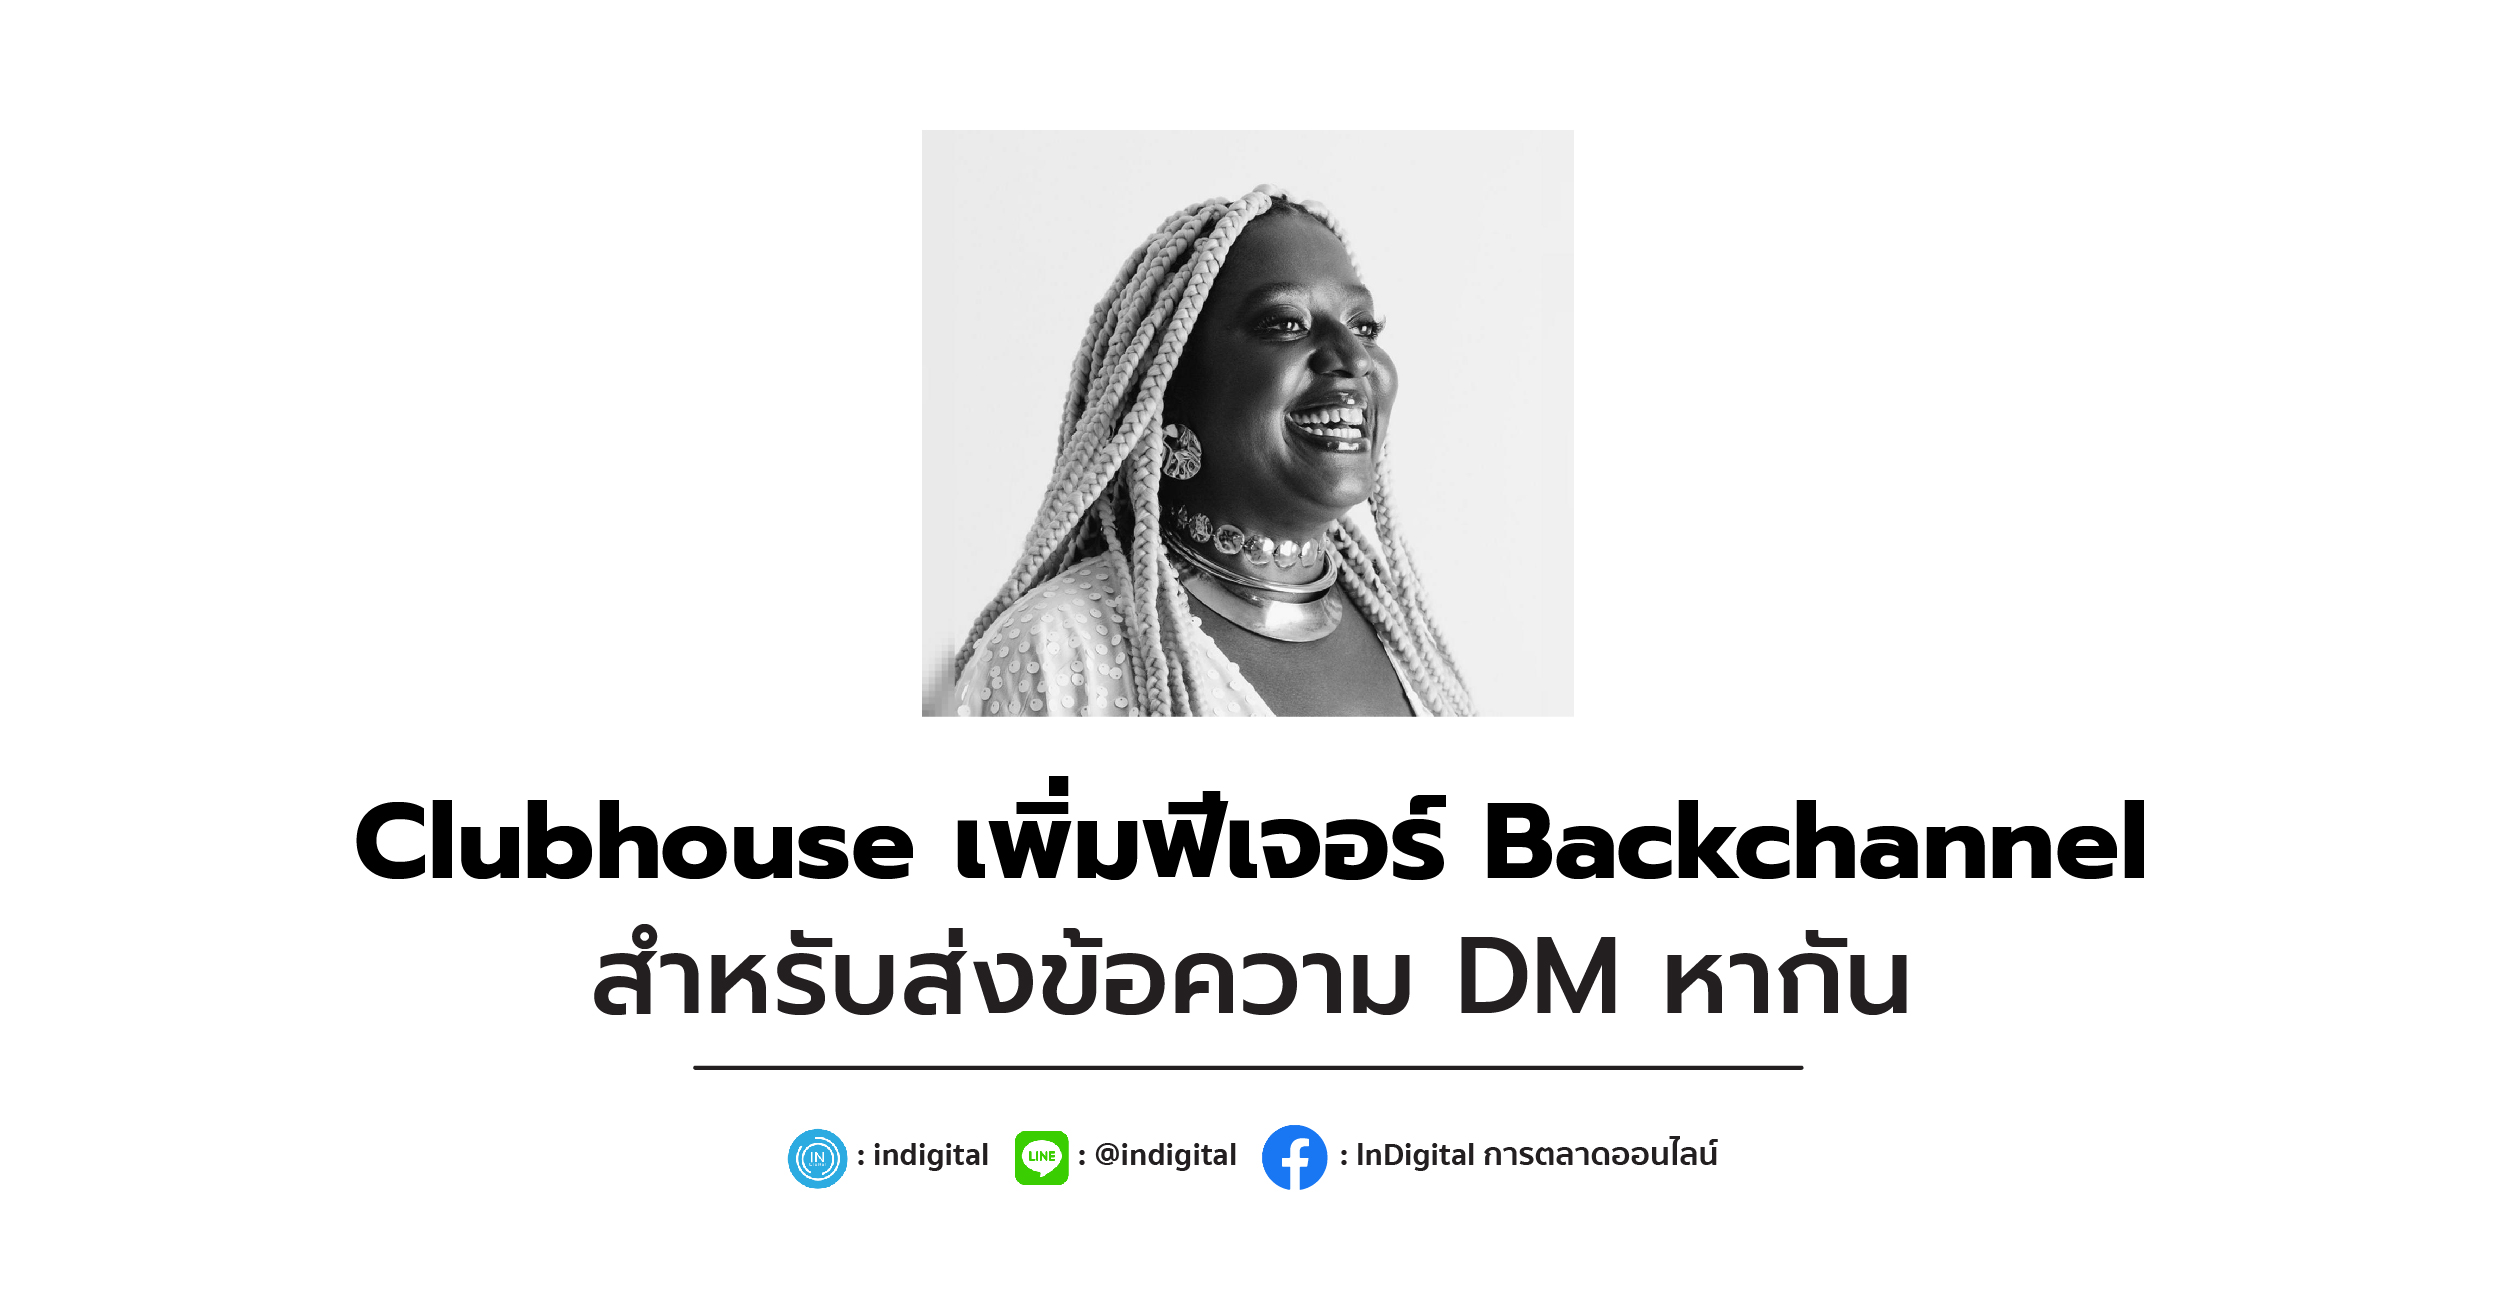 Clubhouse เพิ่มฟีเจอร์ Backchannel สำหรับส่งข้อความ DM หากัน